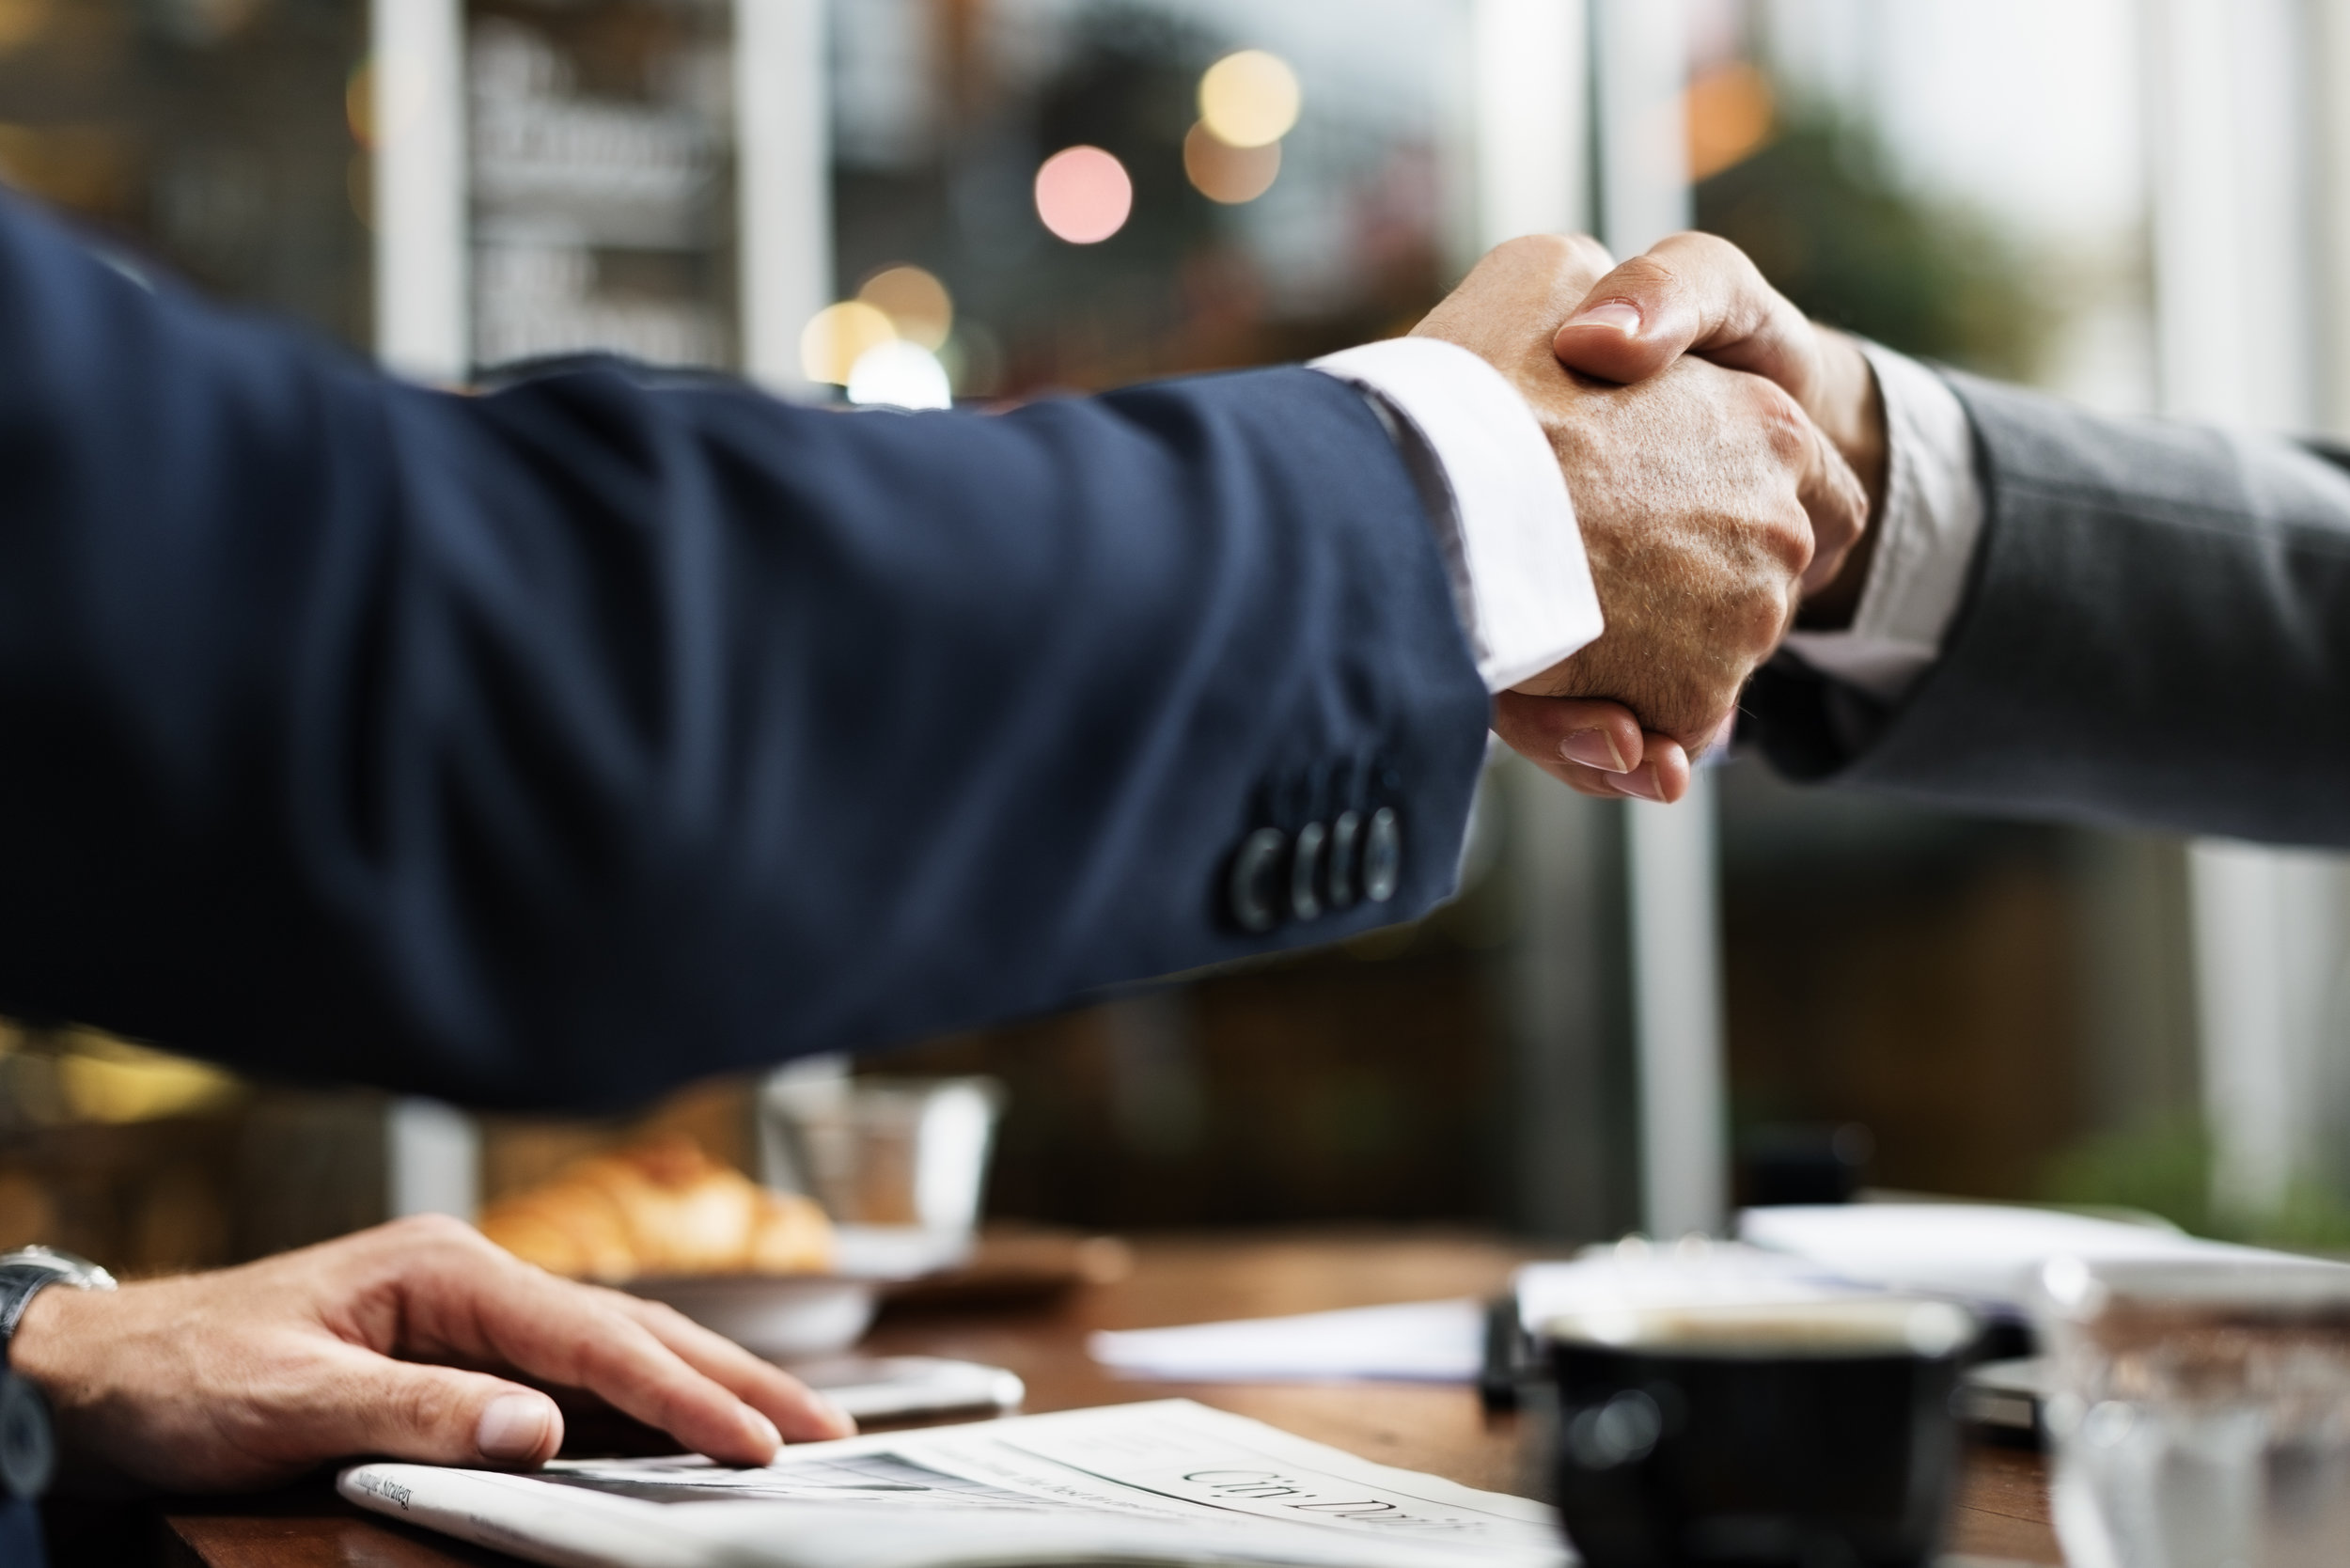 business-handshake-success-deal-concept-PP426KB.jpg